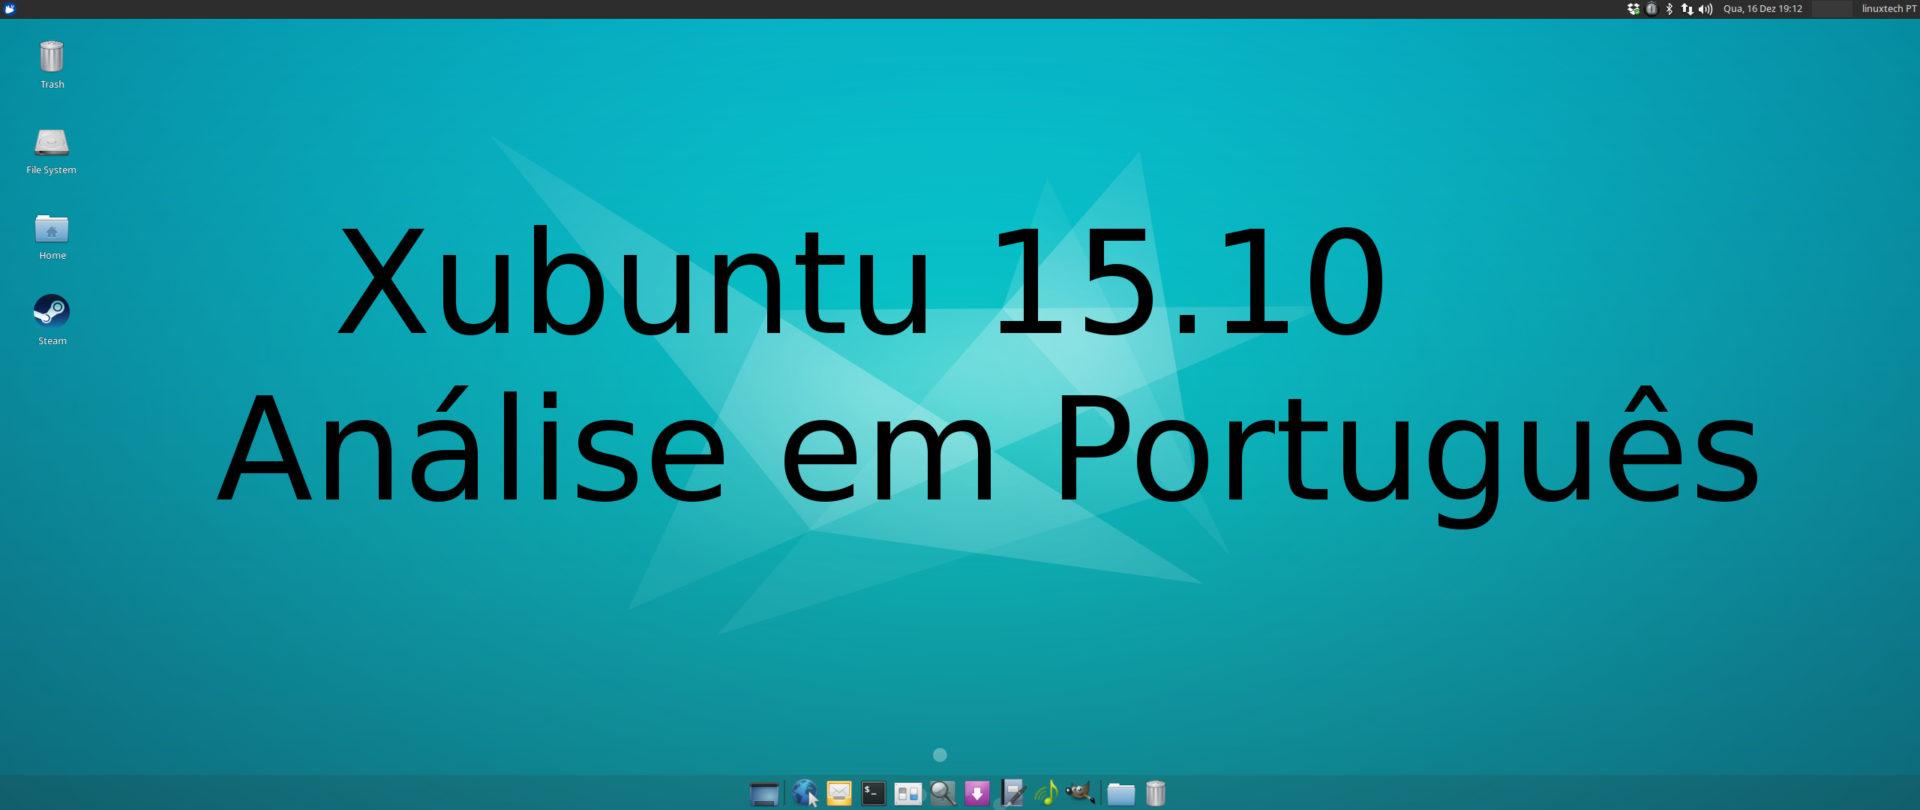 Xubuntu 15.10 – Análise